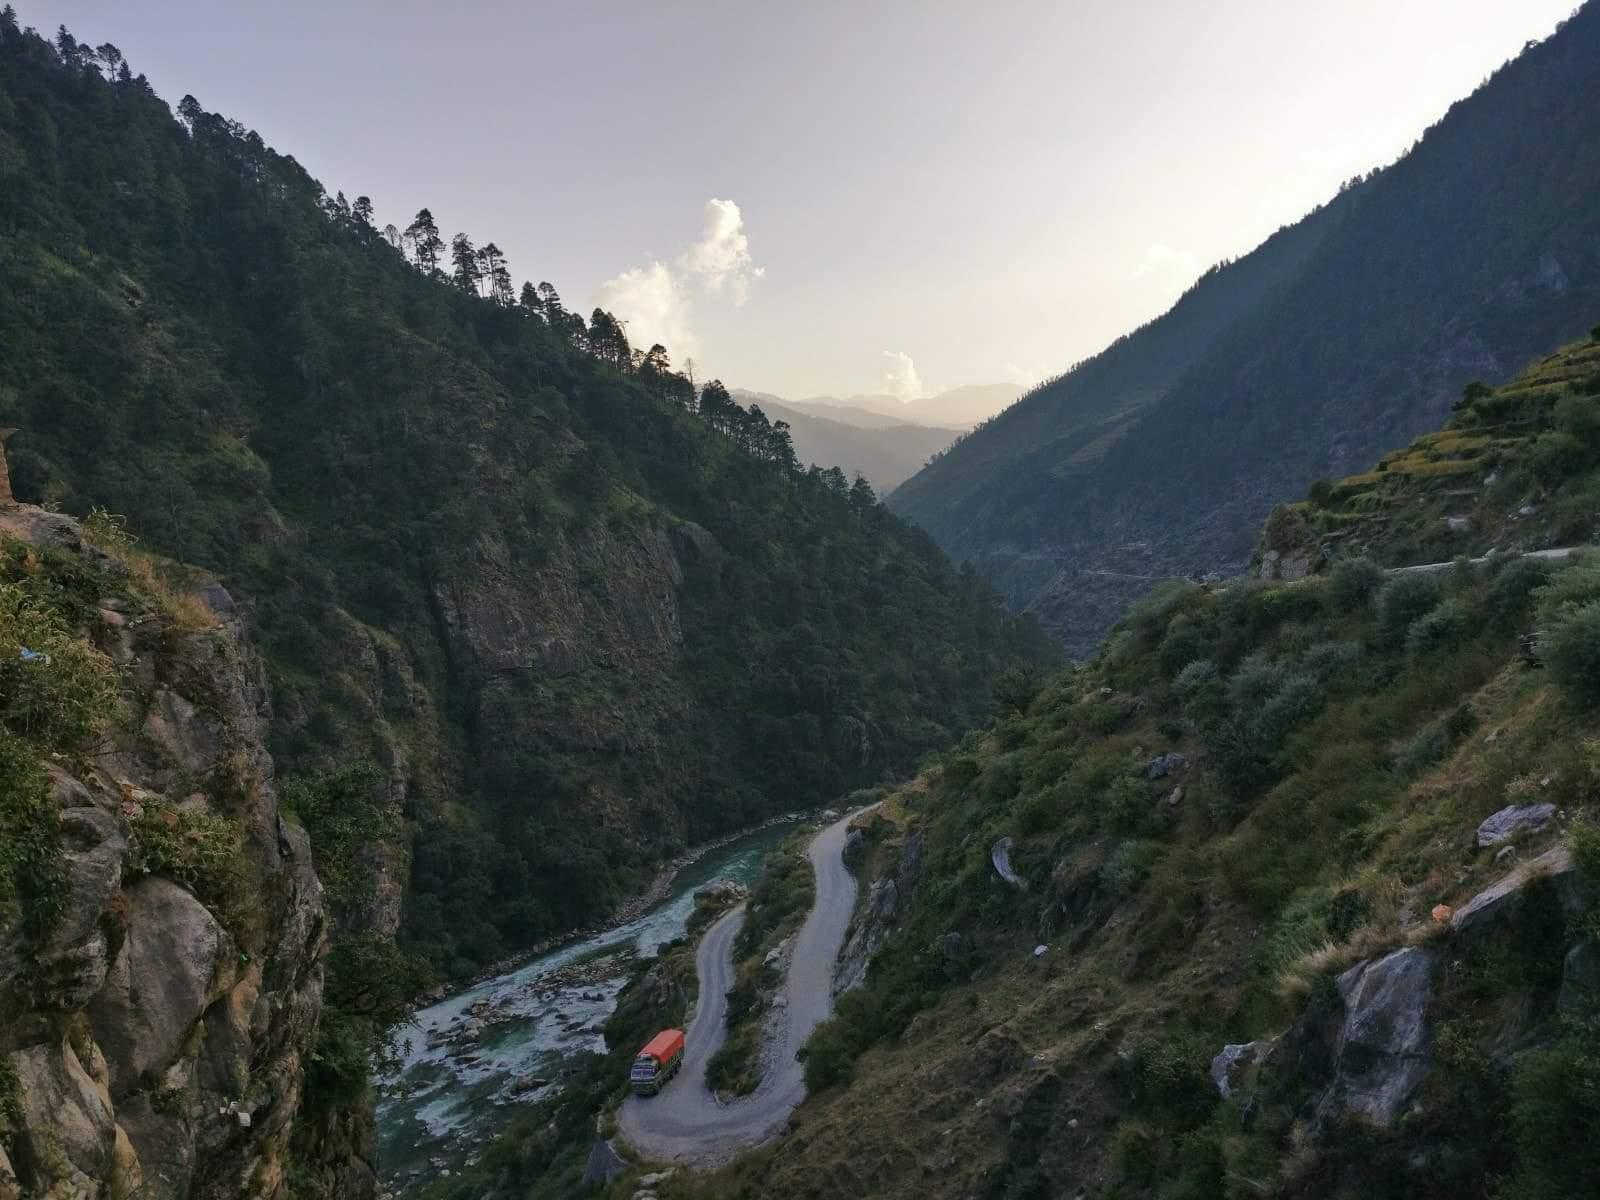 On The Way to Jumla